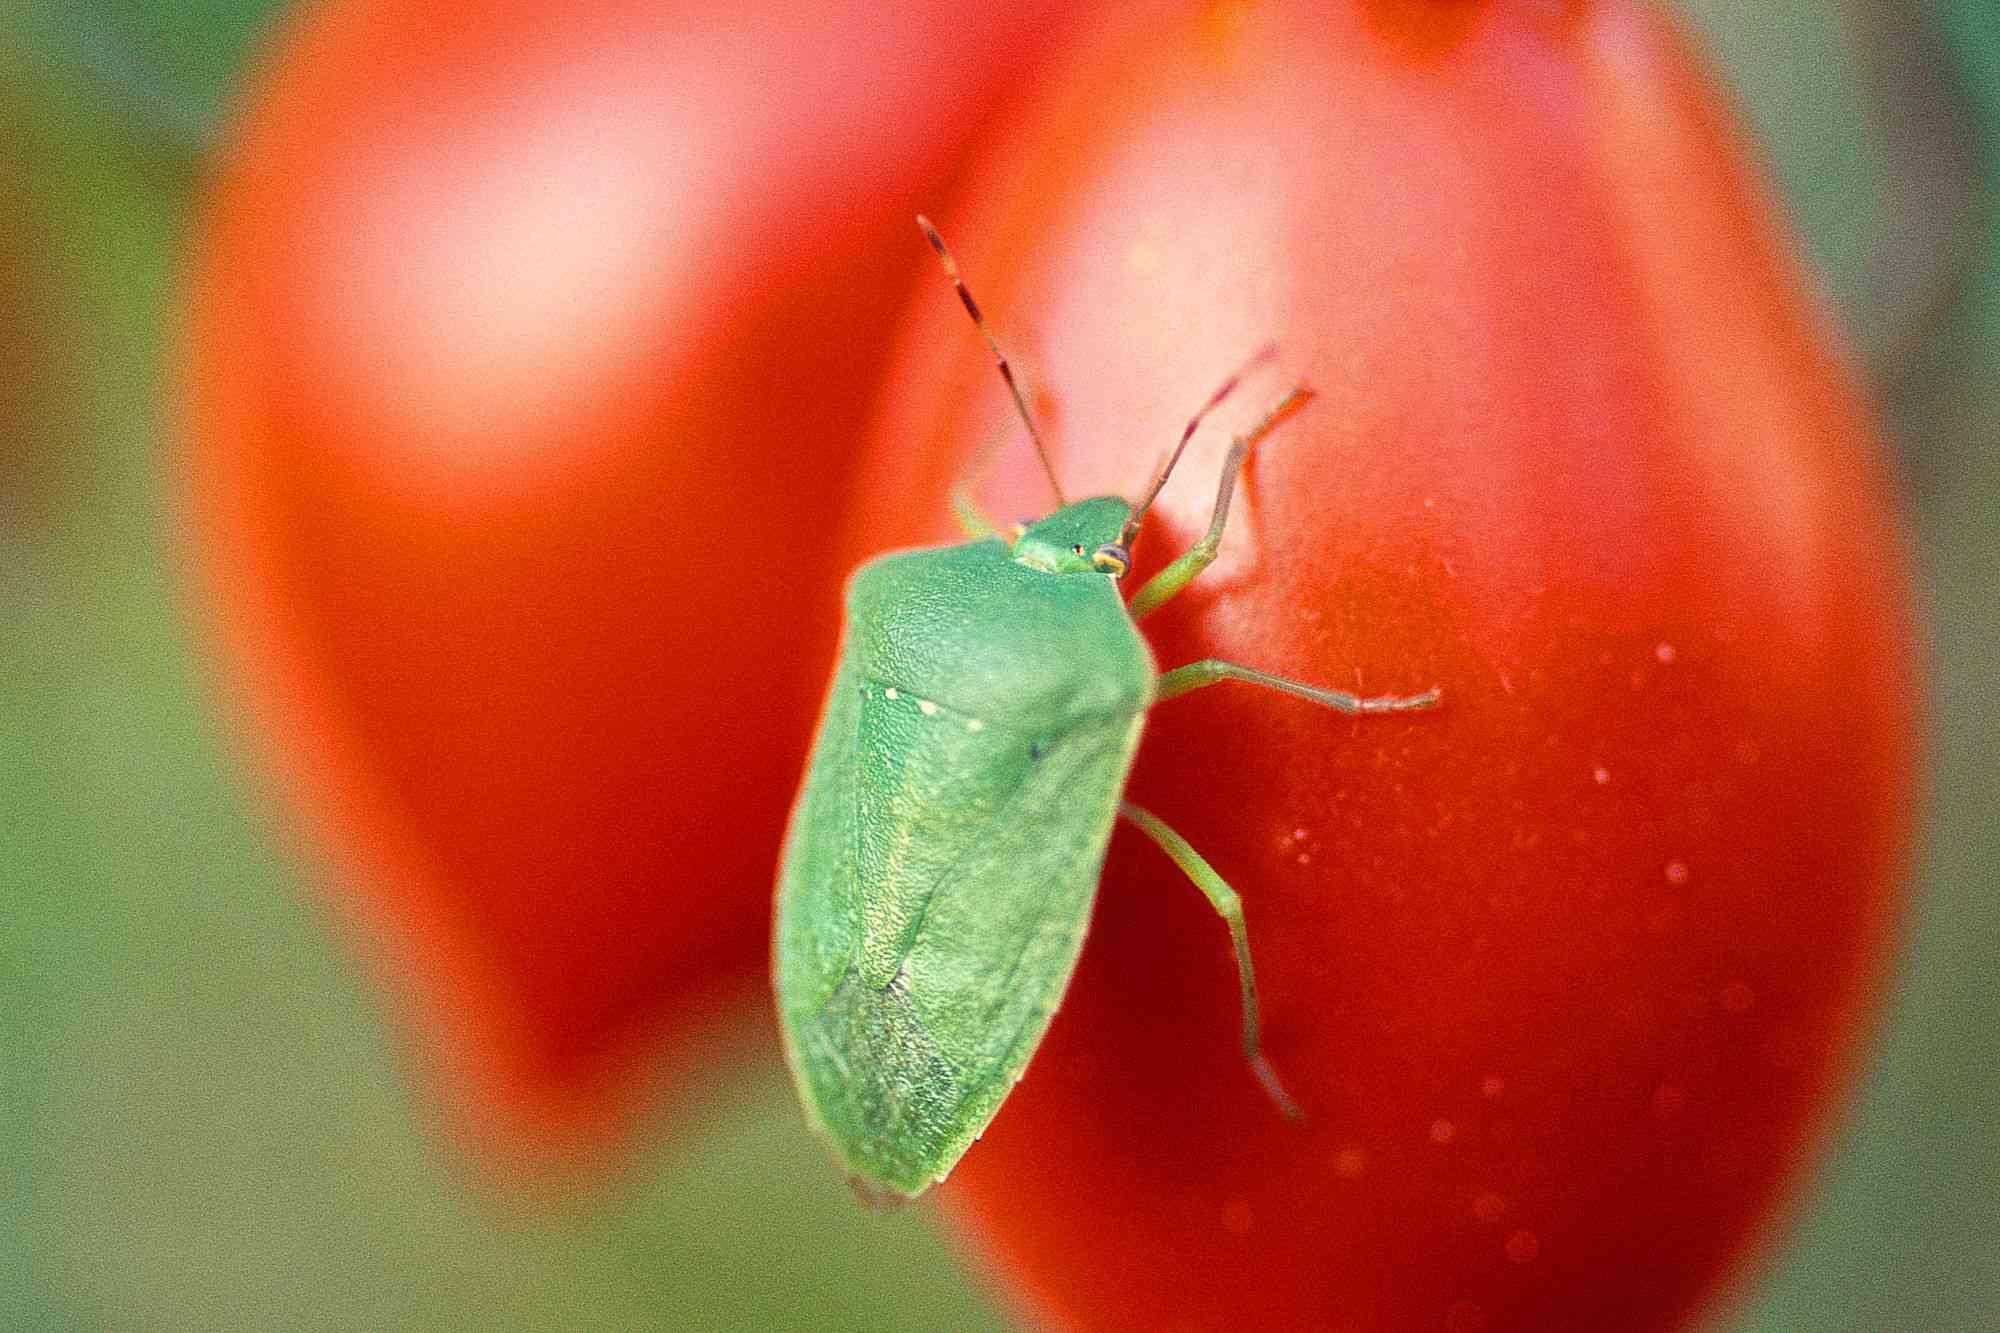 Jumil (stink bug) on tomato